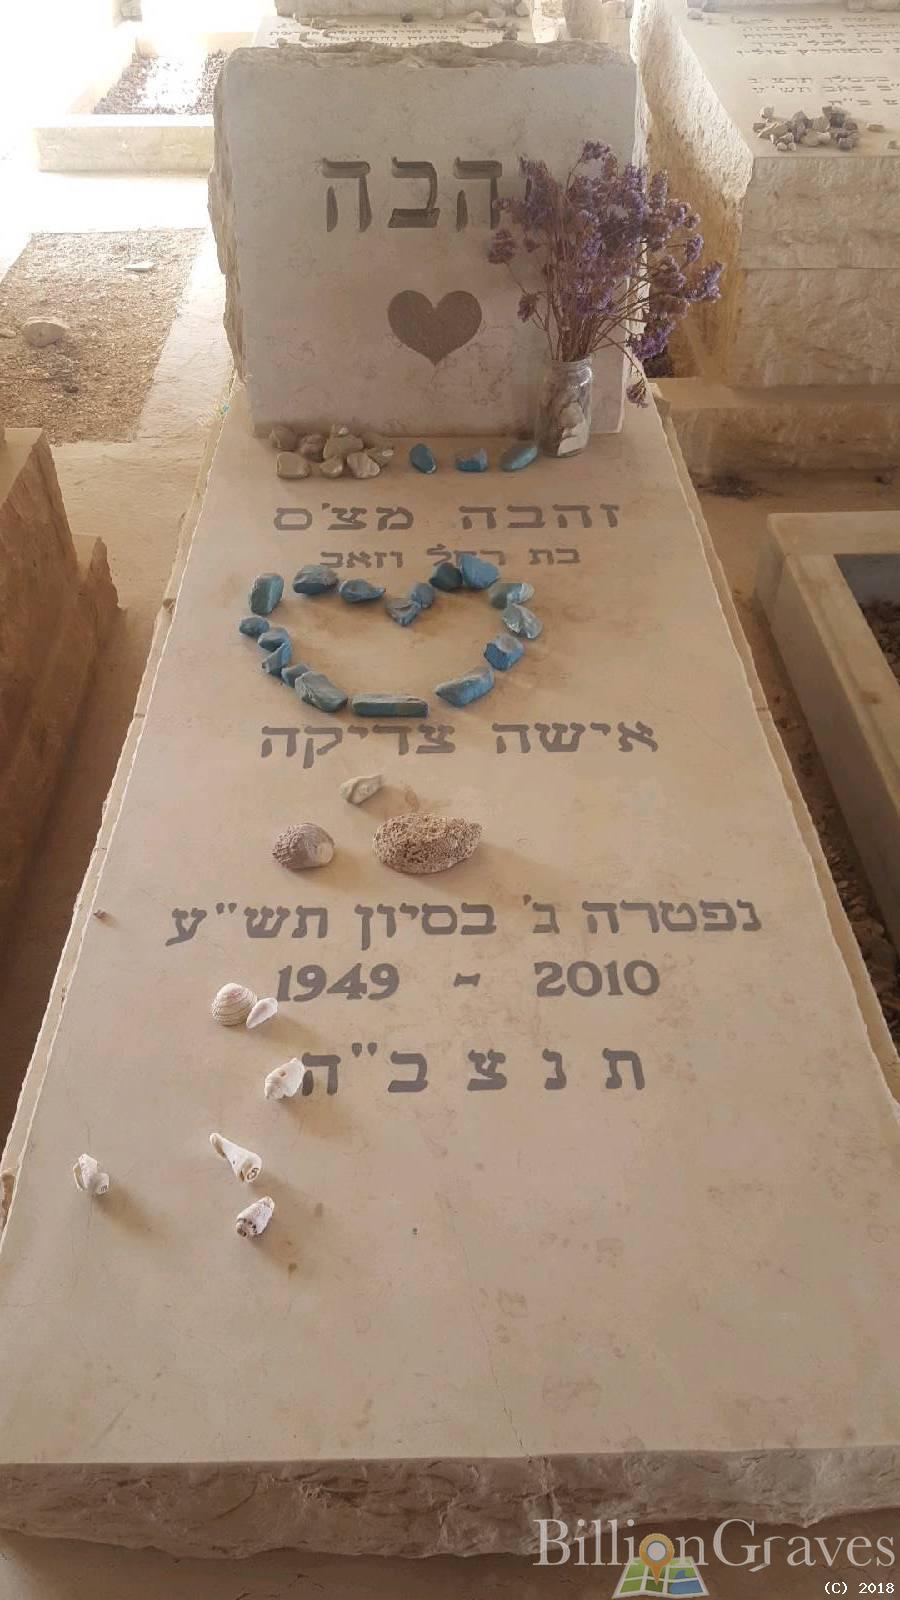 heart, BillionGraves, Jewish, genealogy, family history, GPS, BillionGraves app, Israel, Jew, Hebrew, cemetery, grave, seashells, gravestone